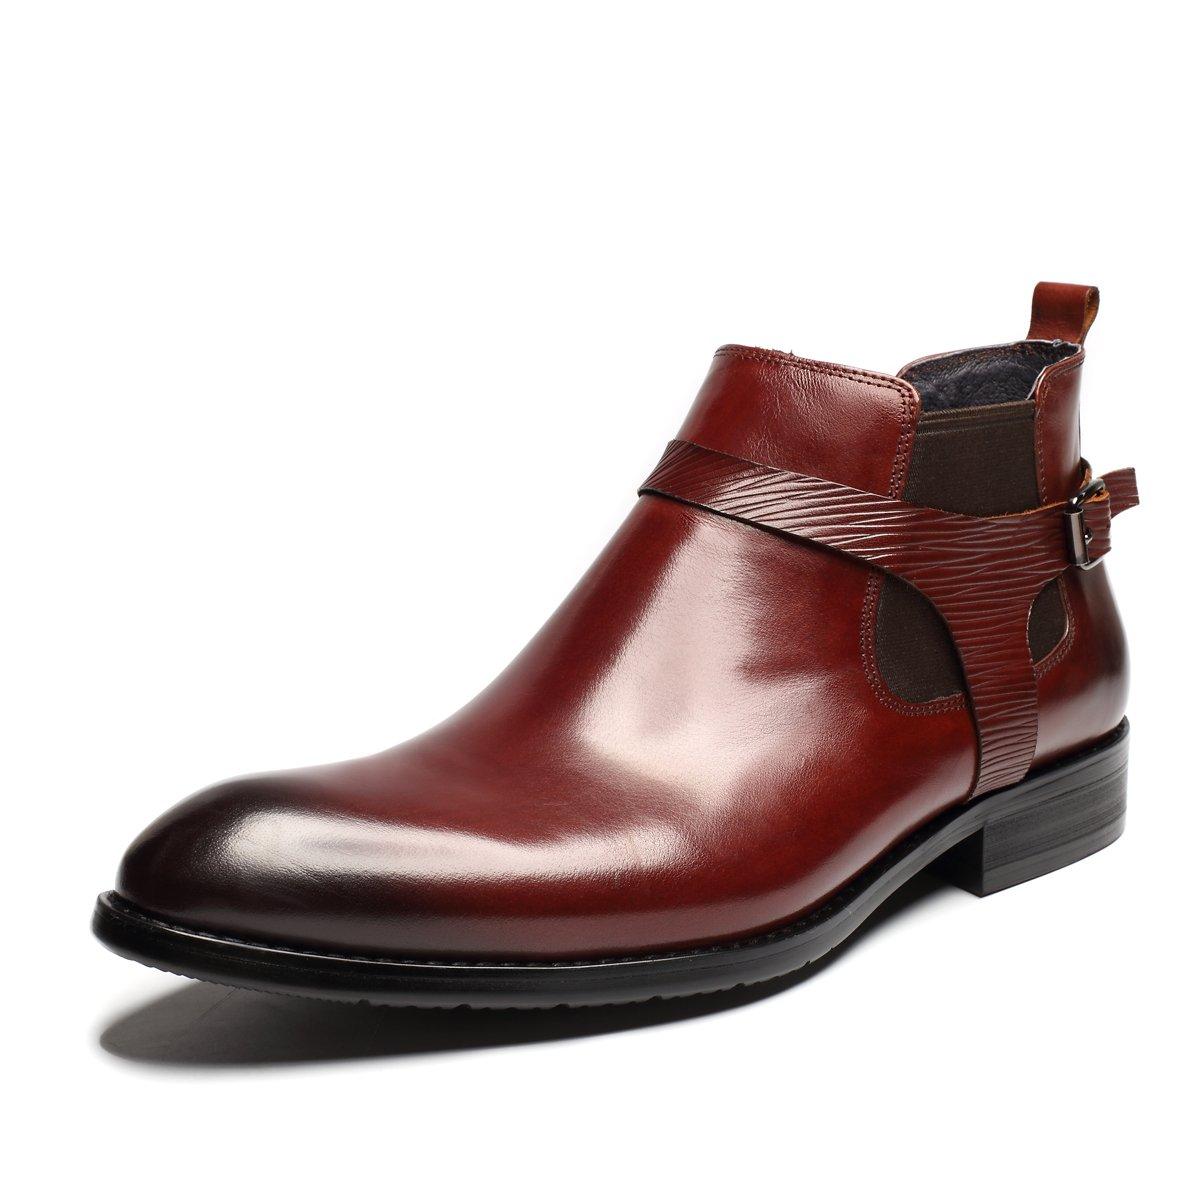 423e2cc6a403f ブーツ メンズ ビジネスシューズ 革靴 本革 チェルシーブーツ サイドゴア モンクストラップ ファッション ブラック レッド B077MKNJDM  24.5 cm